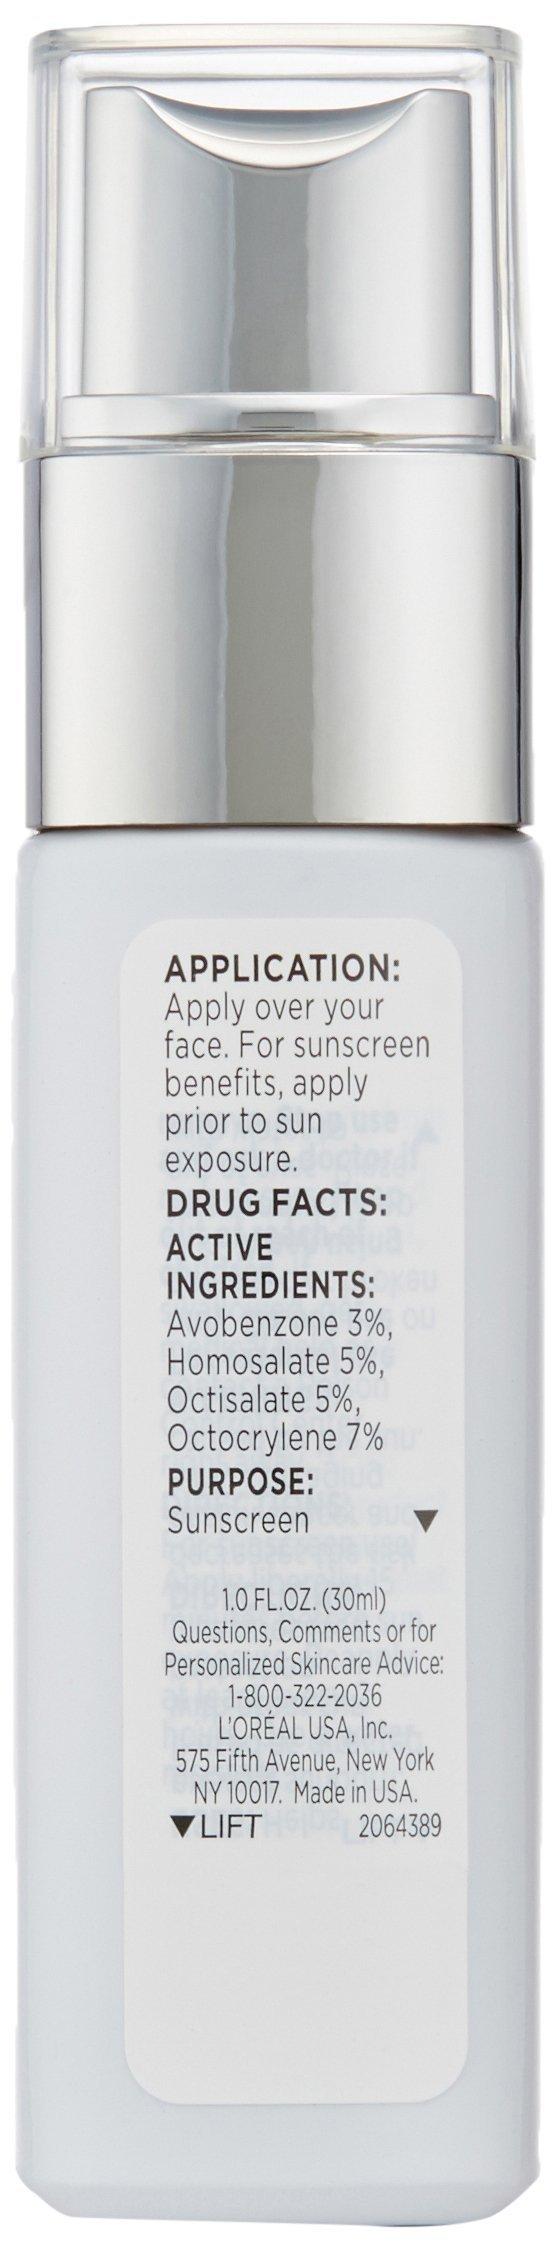 L'Oréal Paris Skincare Revitalift Bright Reveal Face Moisturizer with SPF 30, Glycolic Acid, Vitamin C and Pro-Retinol, 1 fl. oz. by L'Oreal Paris (Image #5)